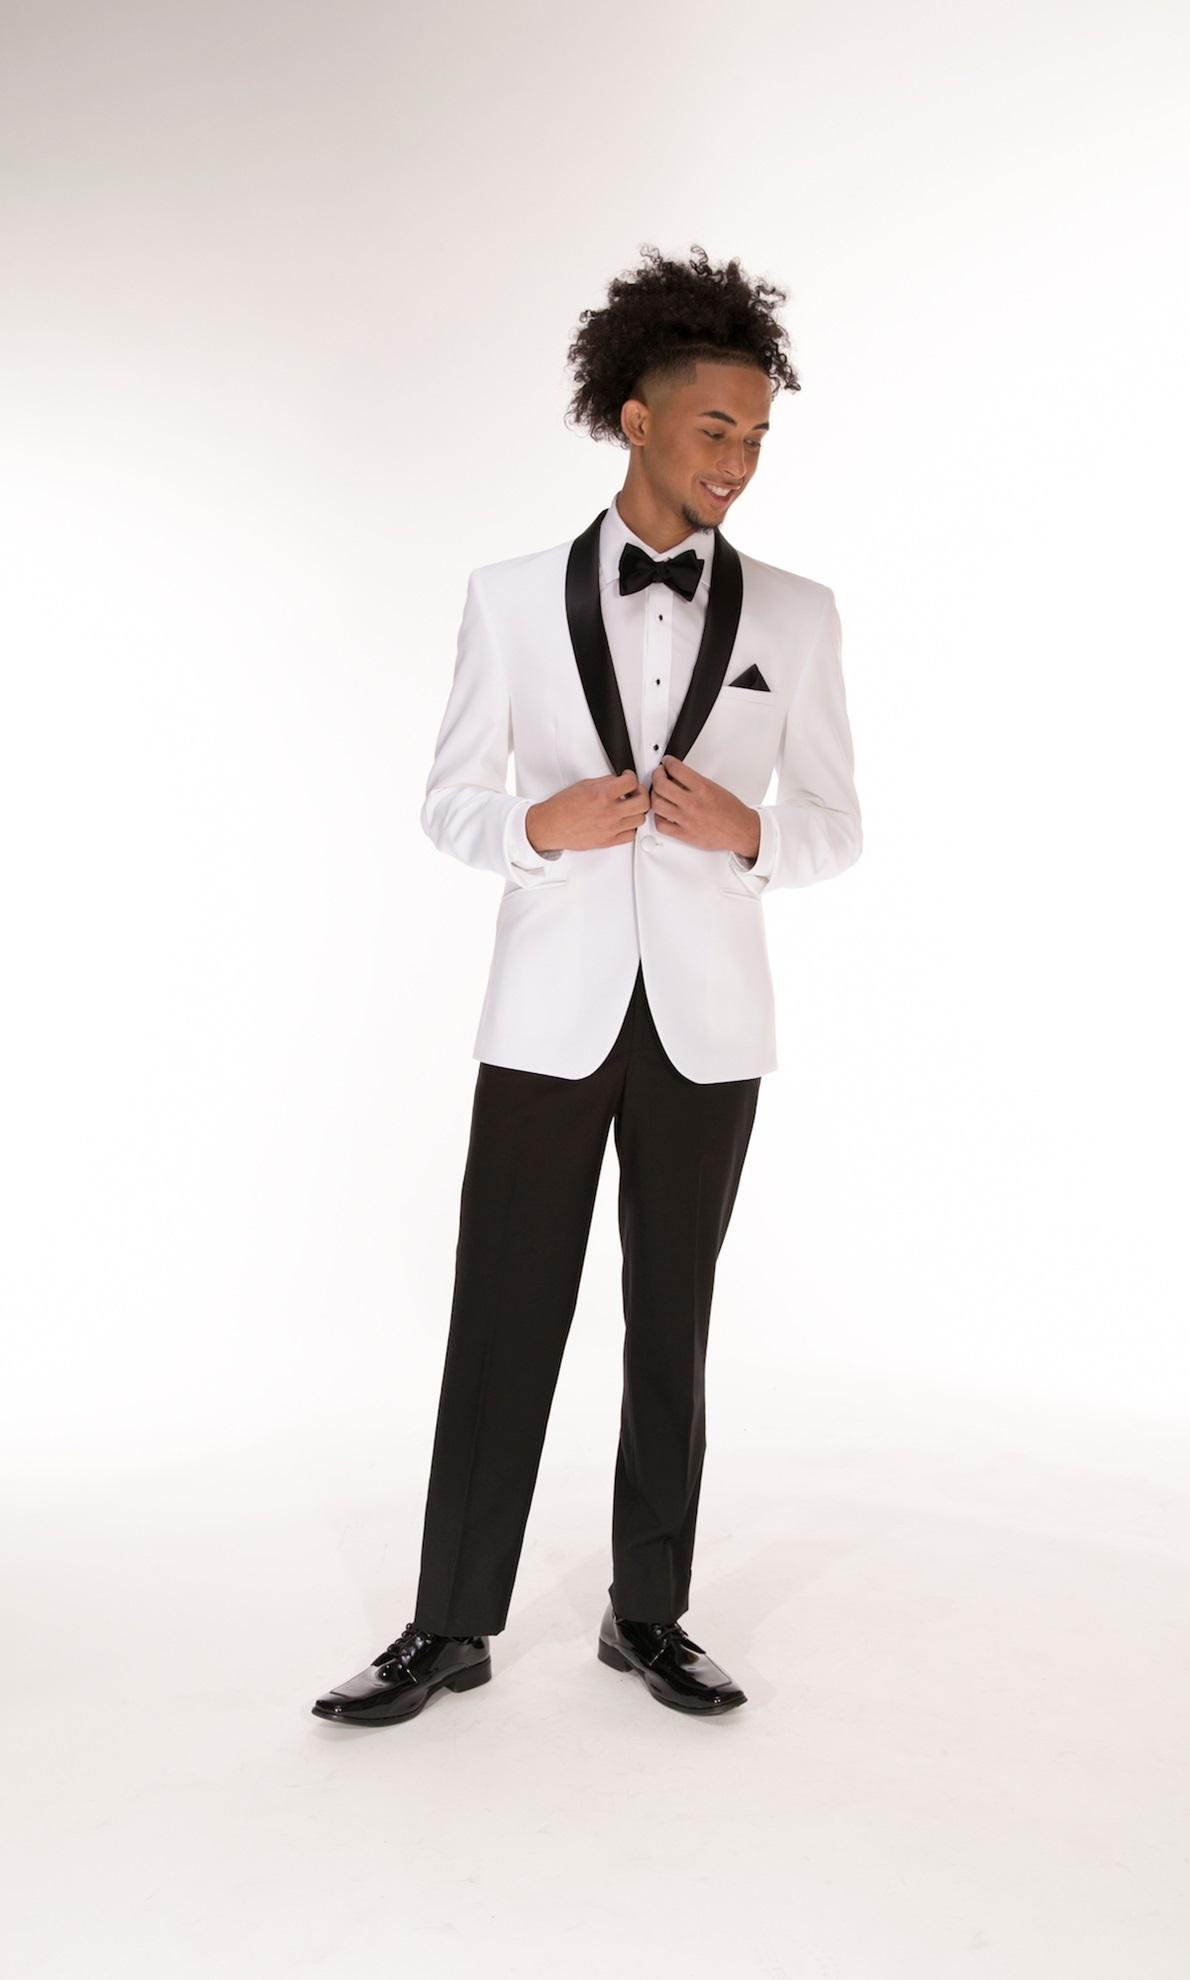 White coat with black lapel